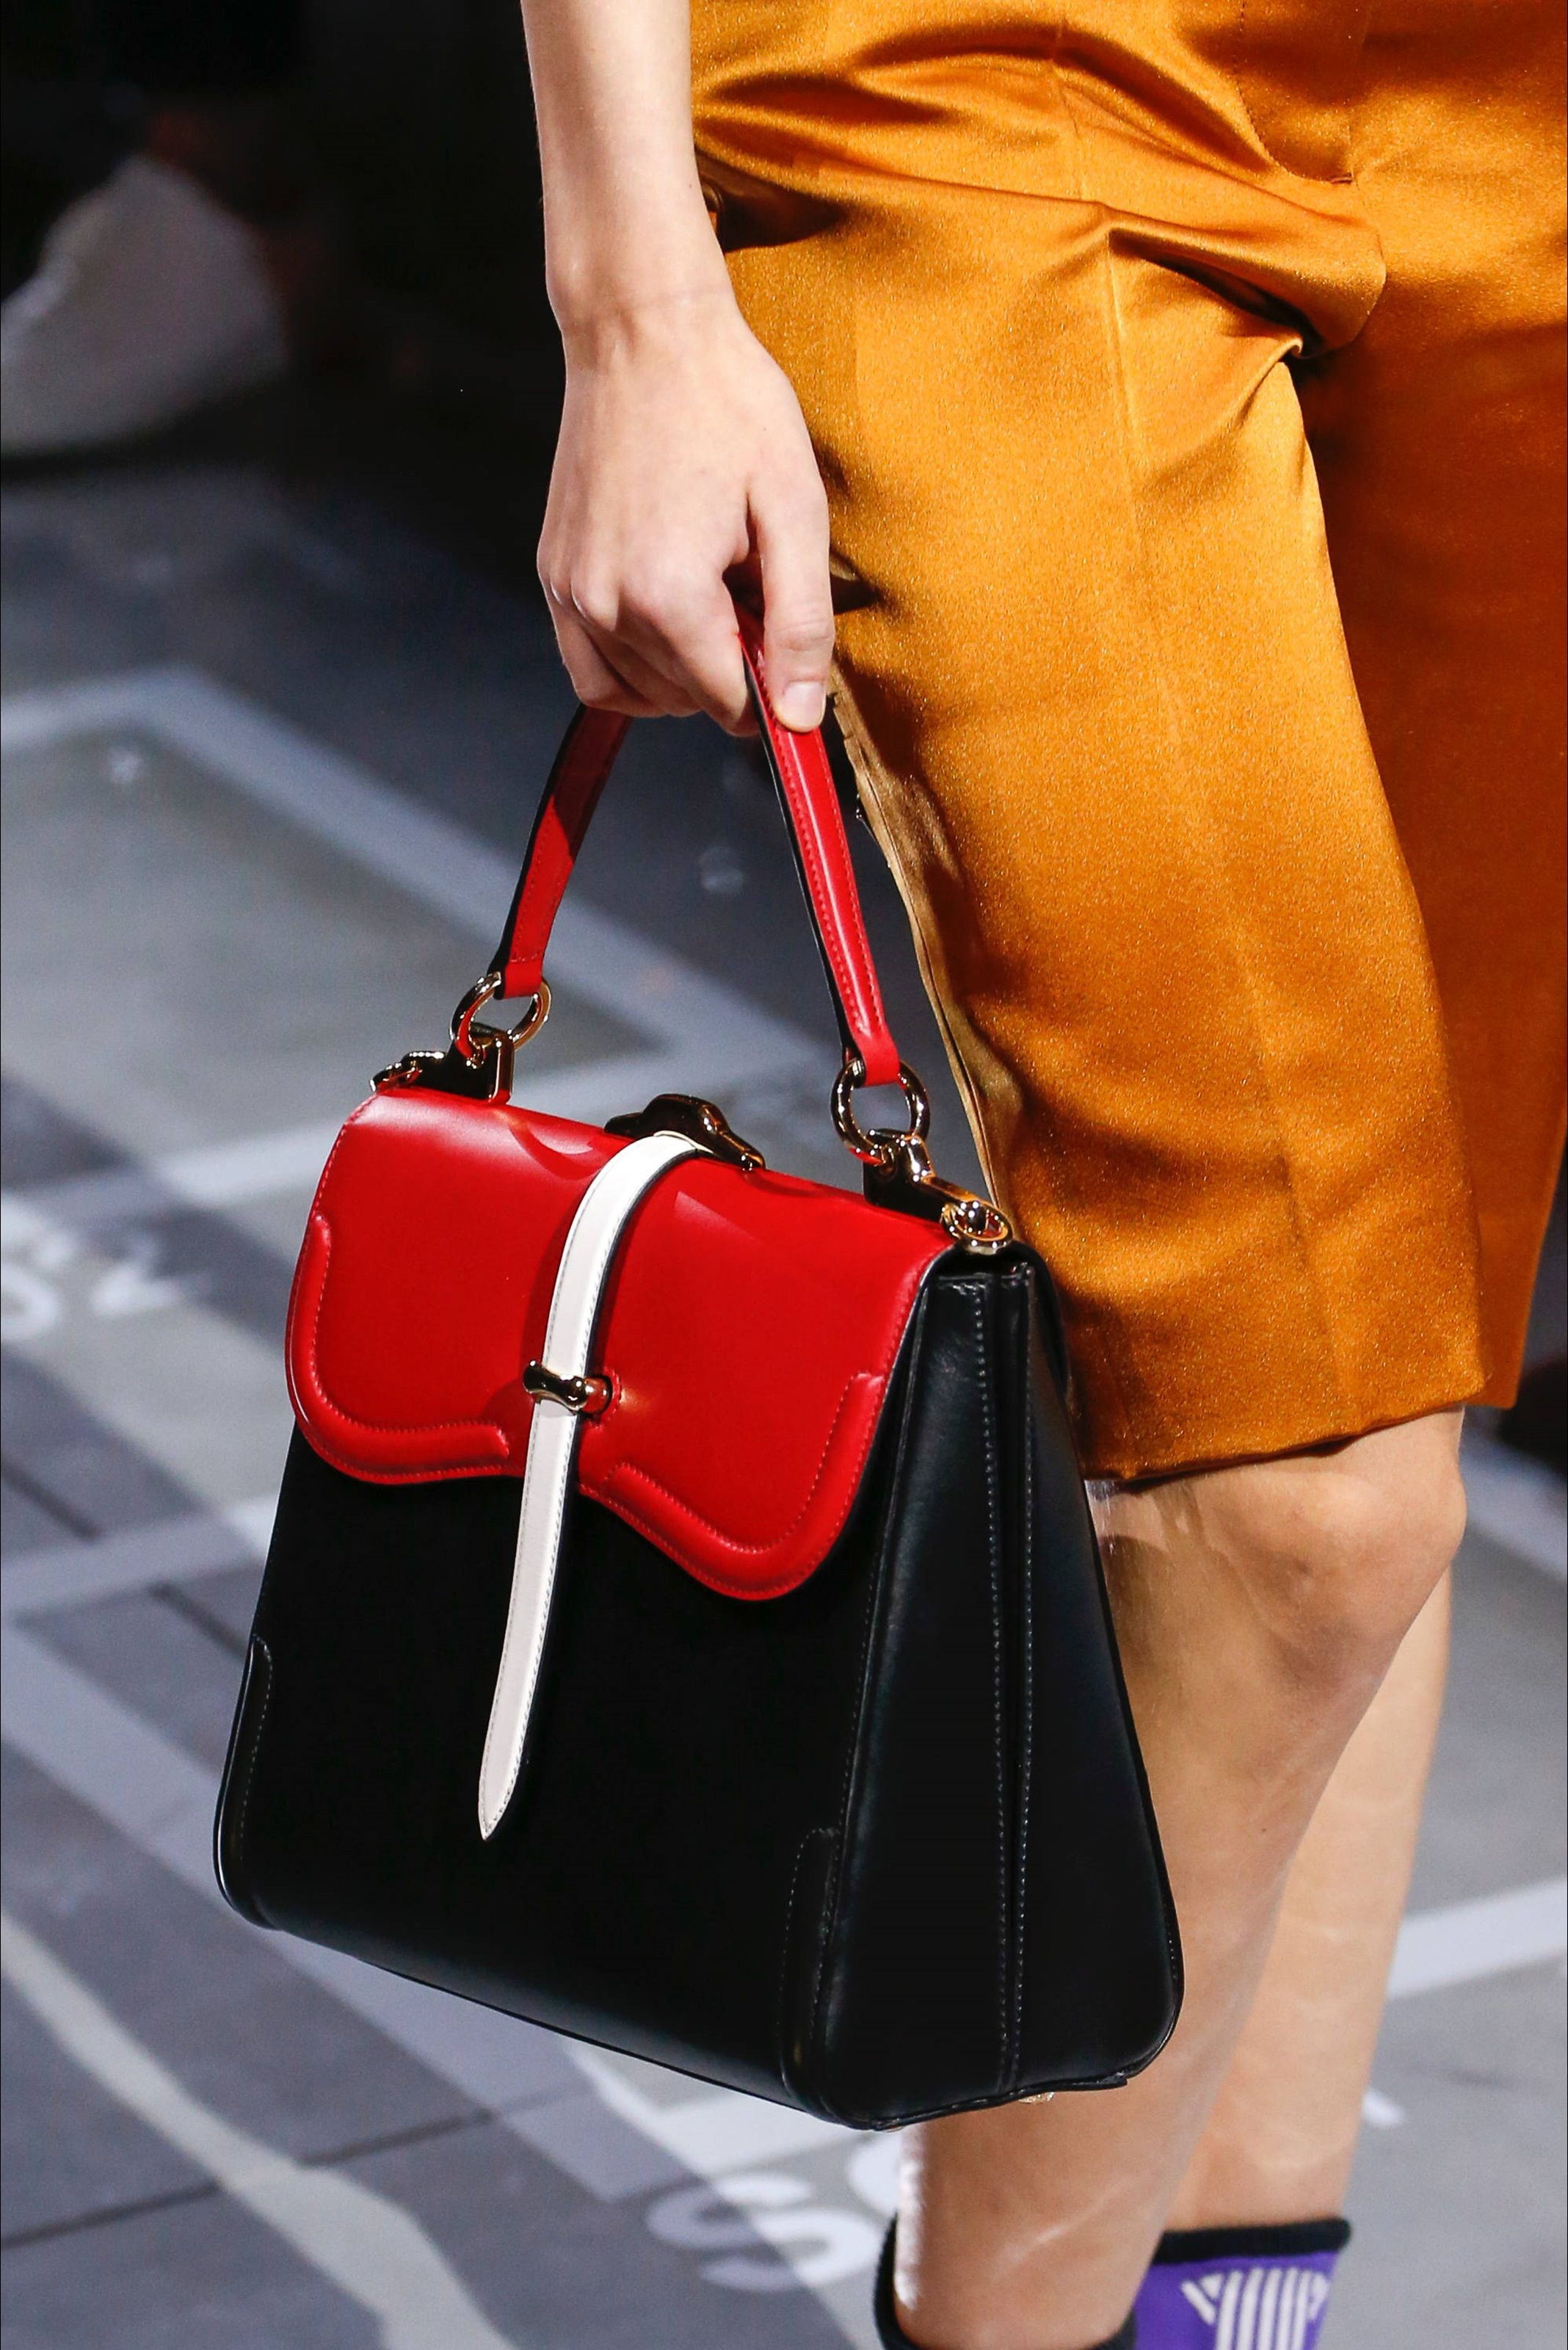 af98c25484 Sfilata Prada Milano - Collezioni Primavera Estate 2019 - Dettagli - Vogue